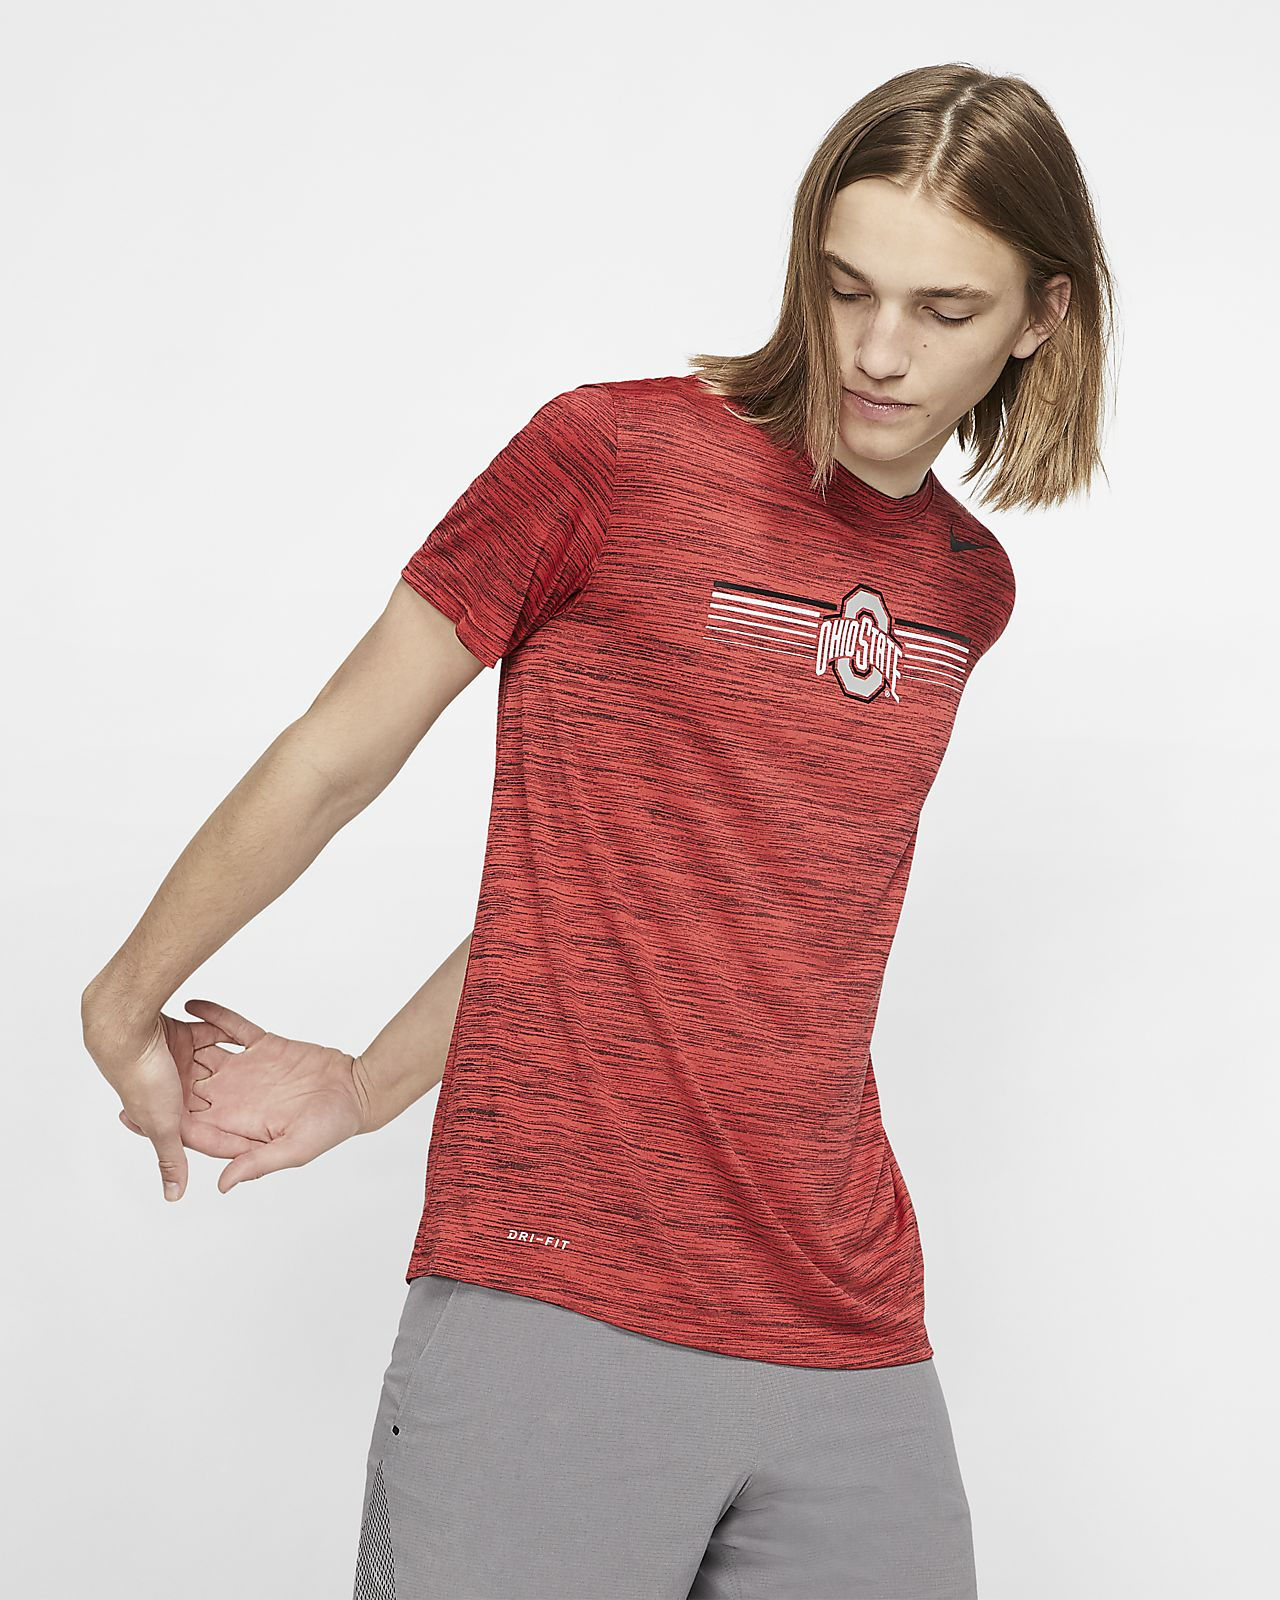 Nike College Dri-FIT Legend Velocity (Ohio State) Men's T-Shirt